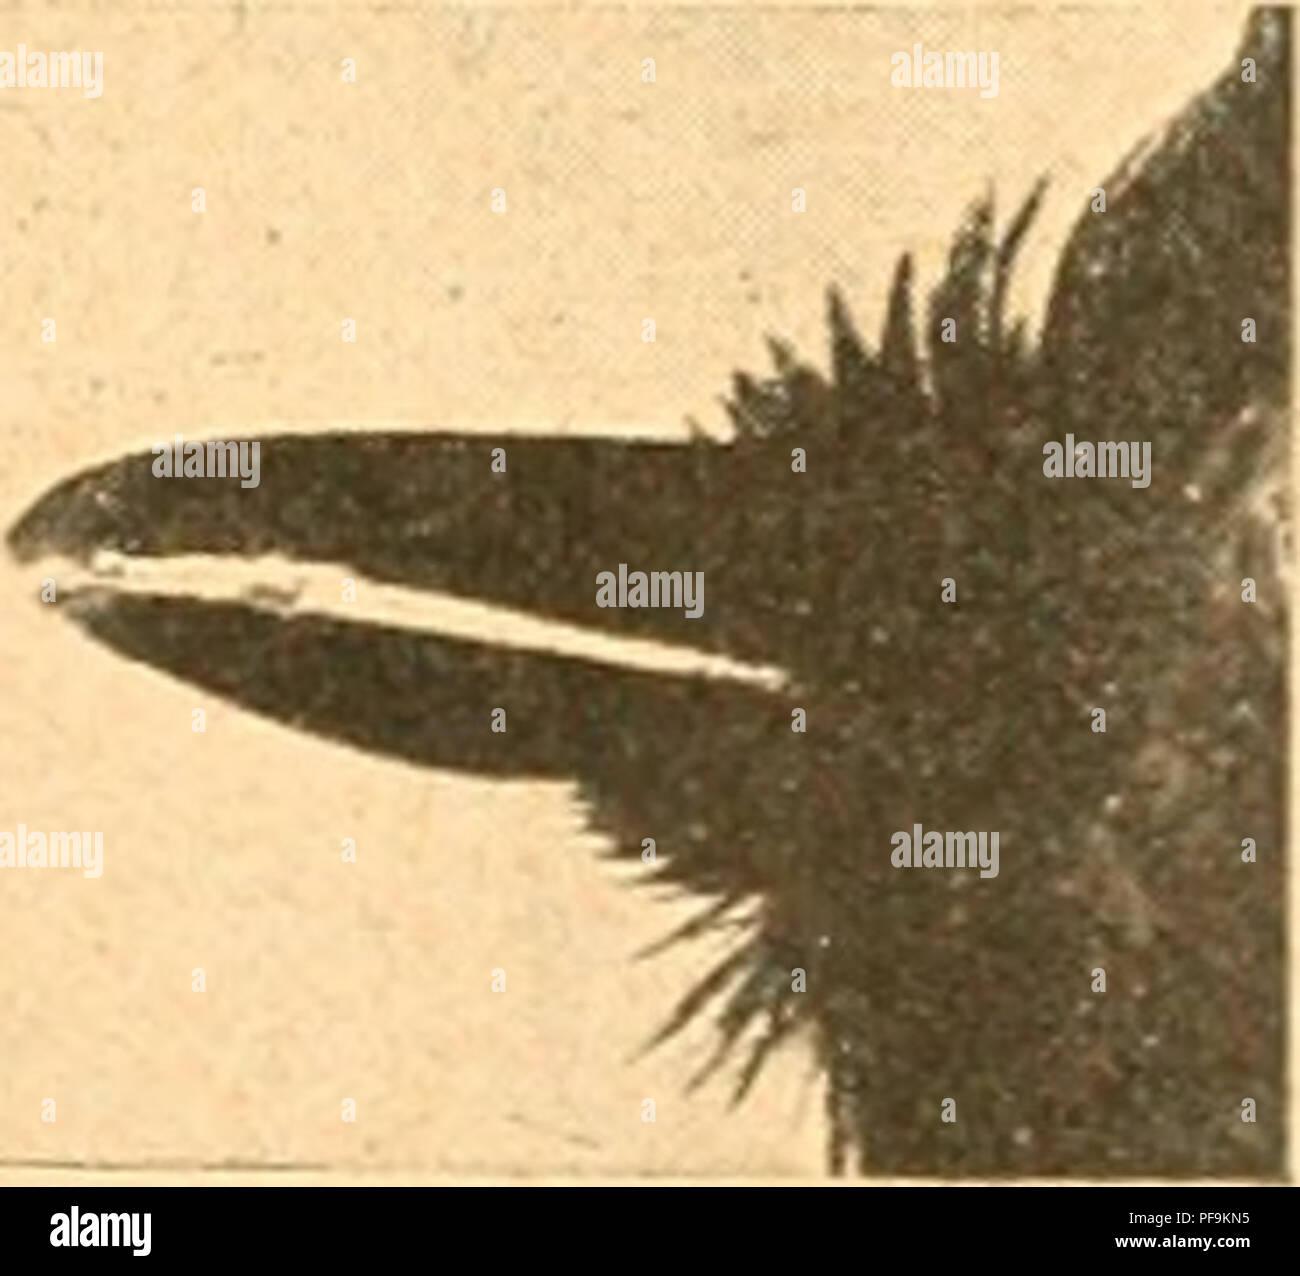 Ant Shrike Stock Photos & Ant Shrike Stock Images - Alamy